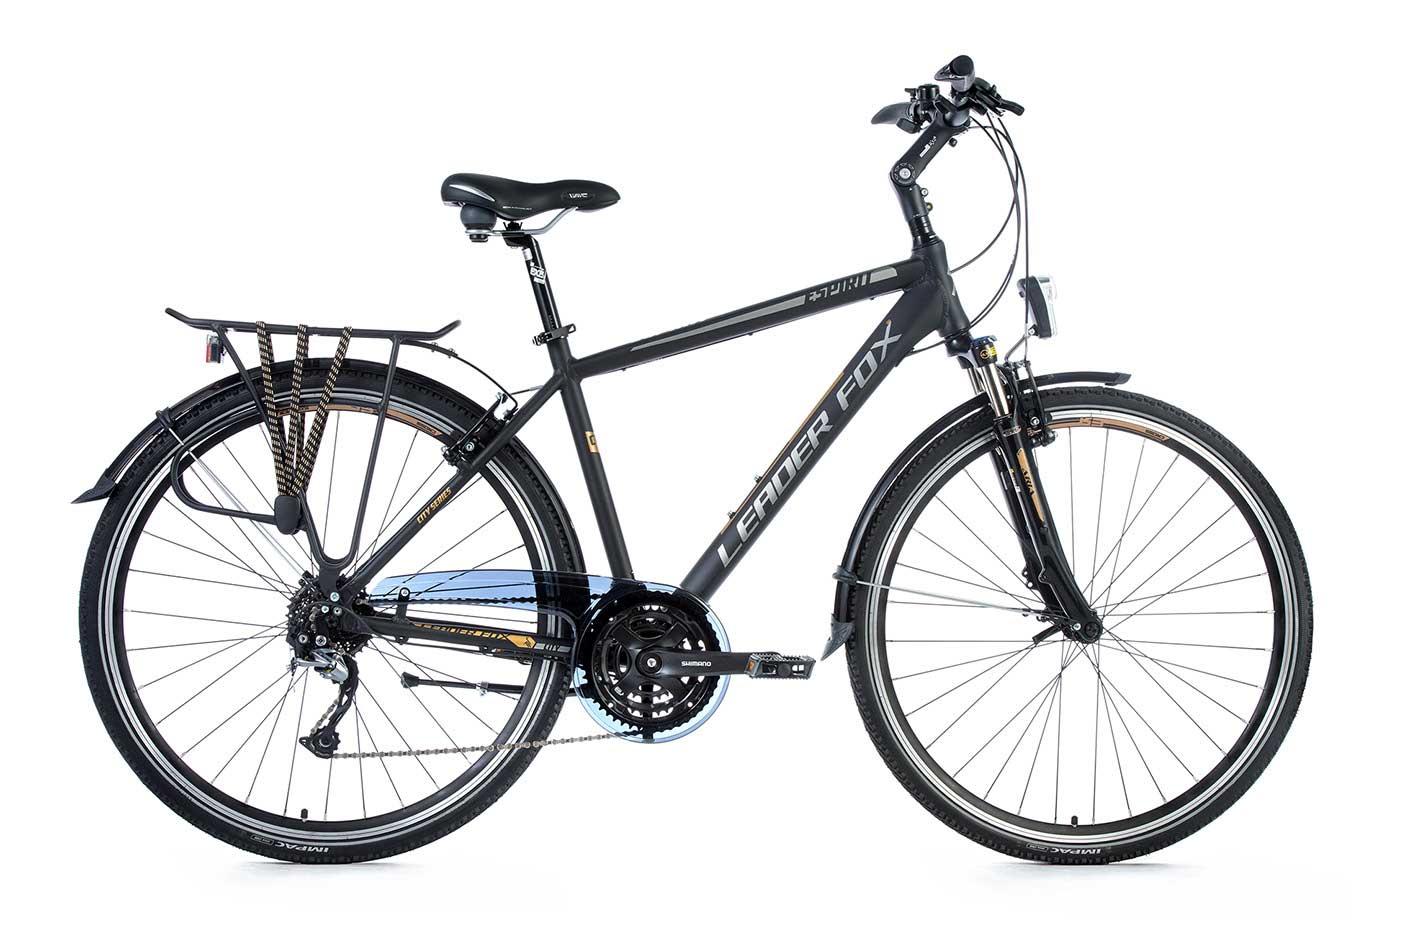 Bicicleta de Oras Leader Fox ESPIRIT gent,2018